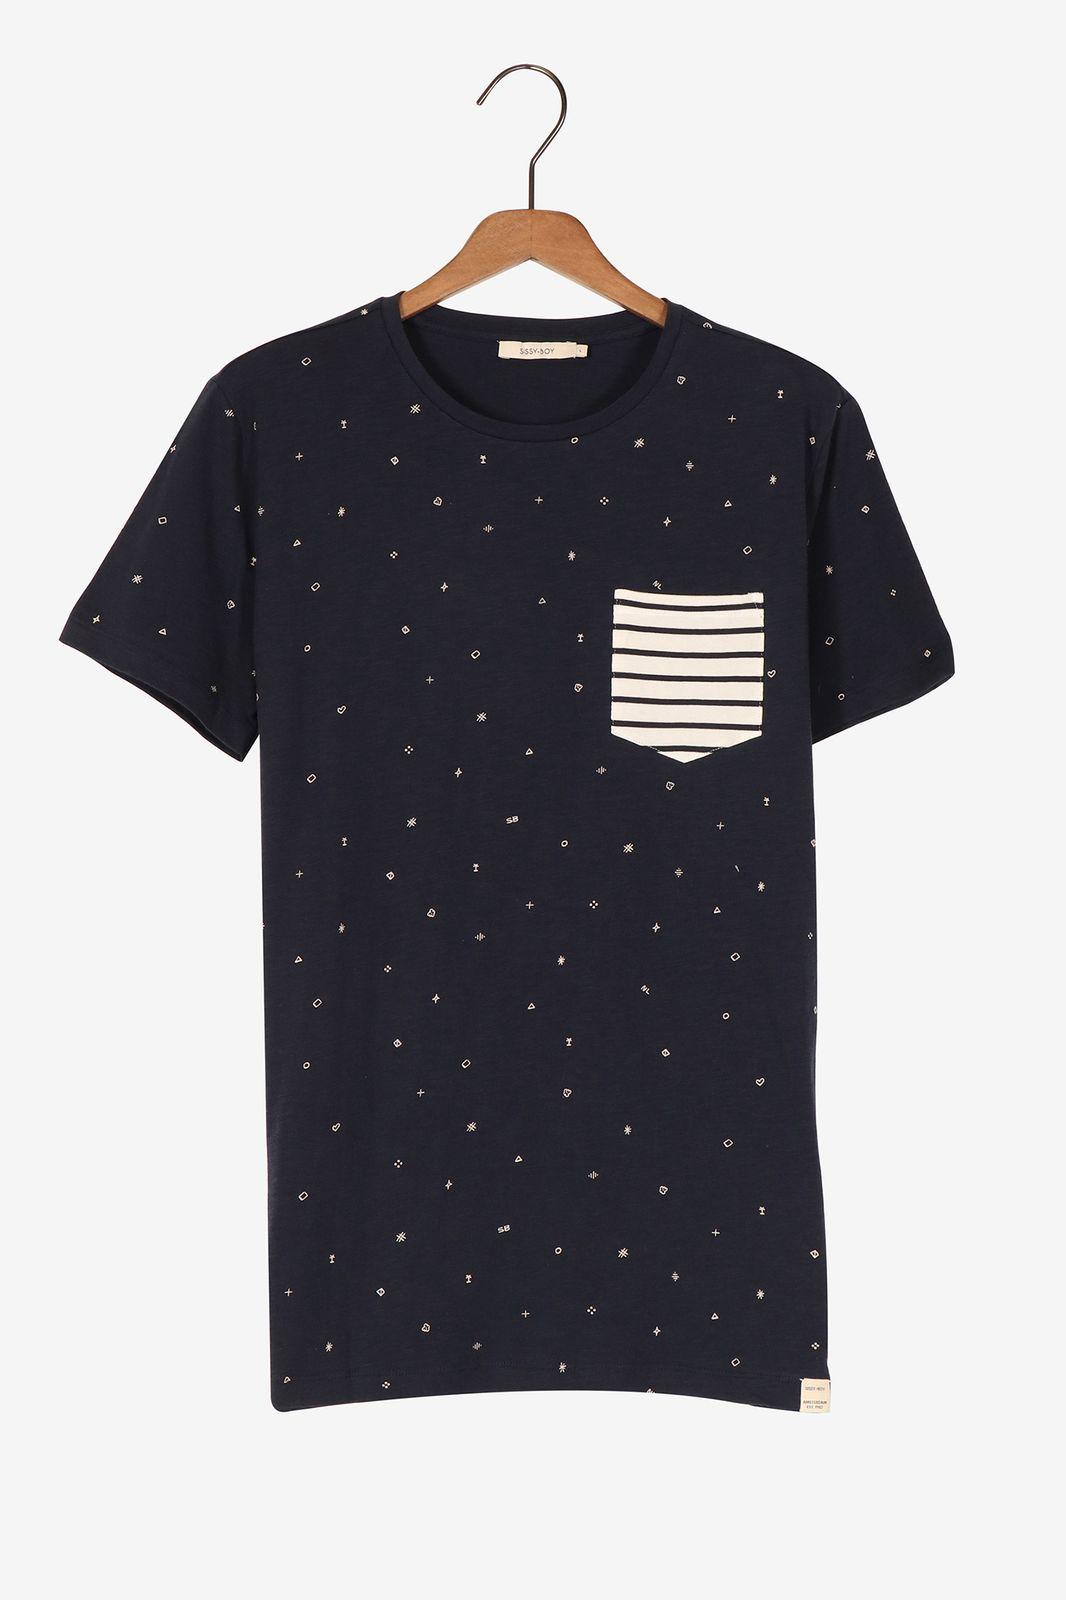 Donkerblauw t-shirt met constrasterend borstzakje